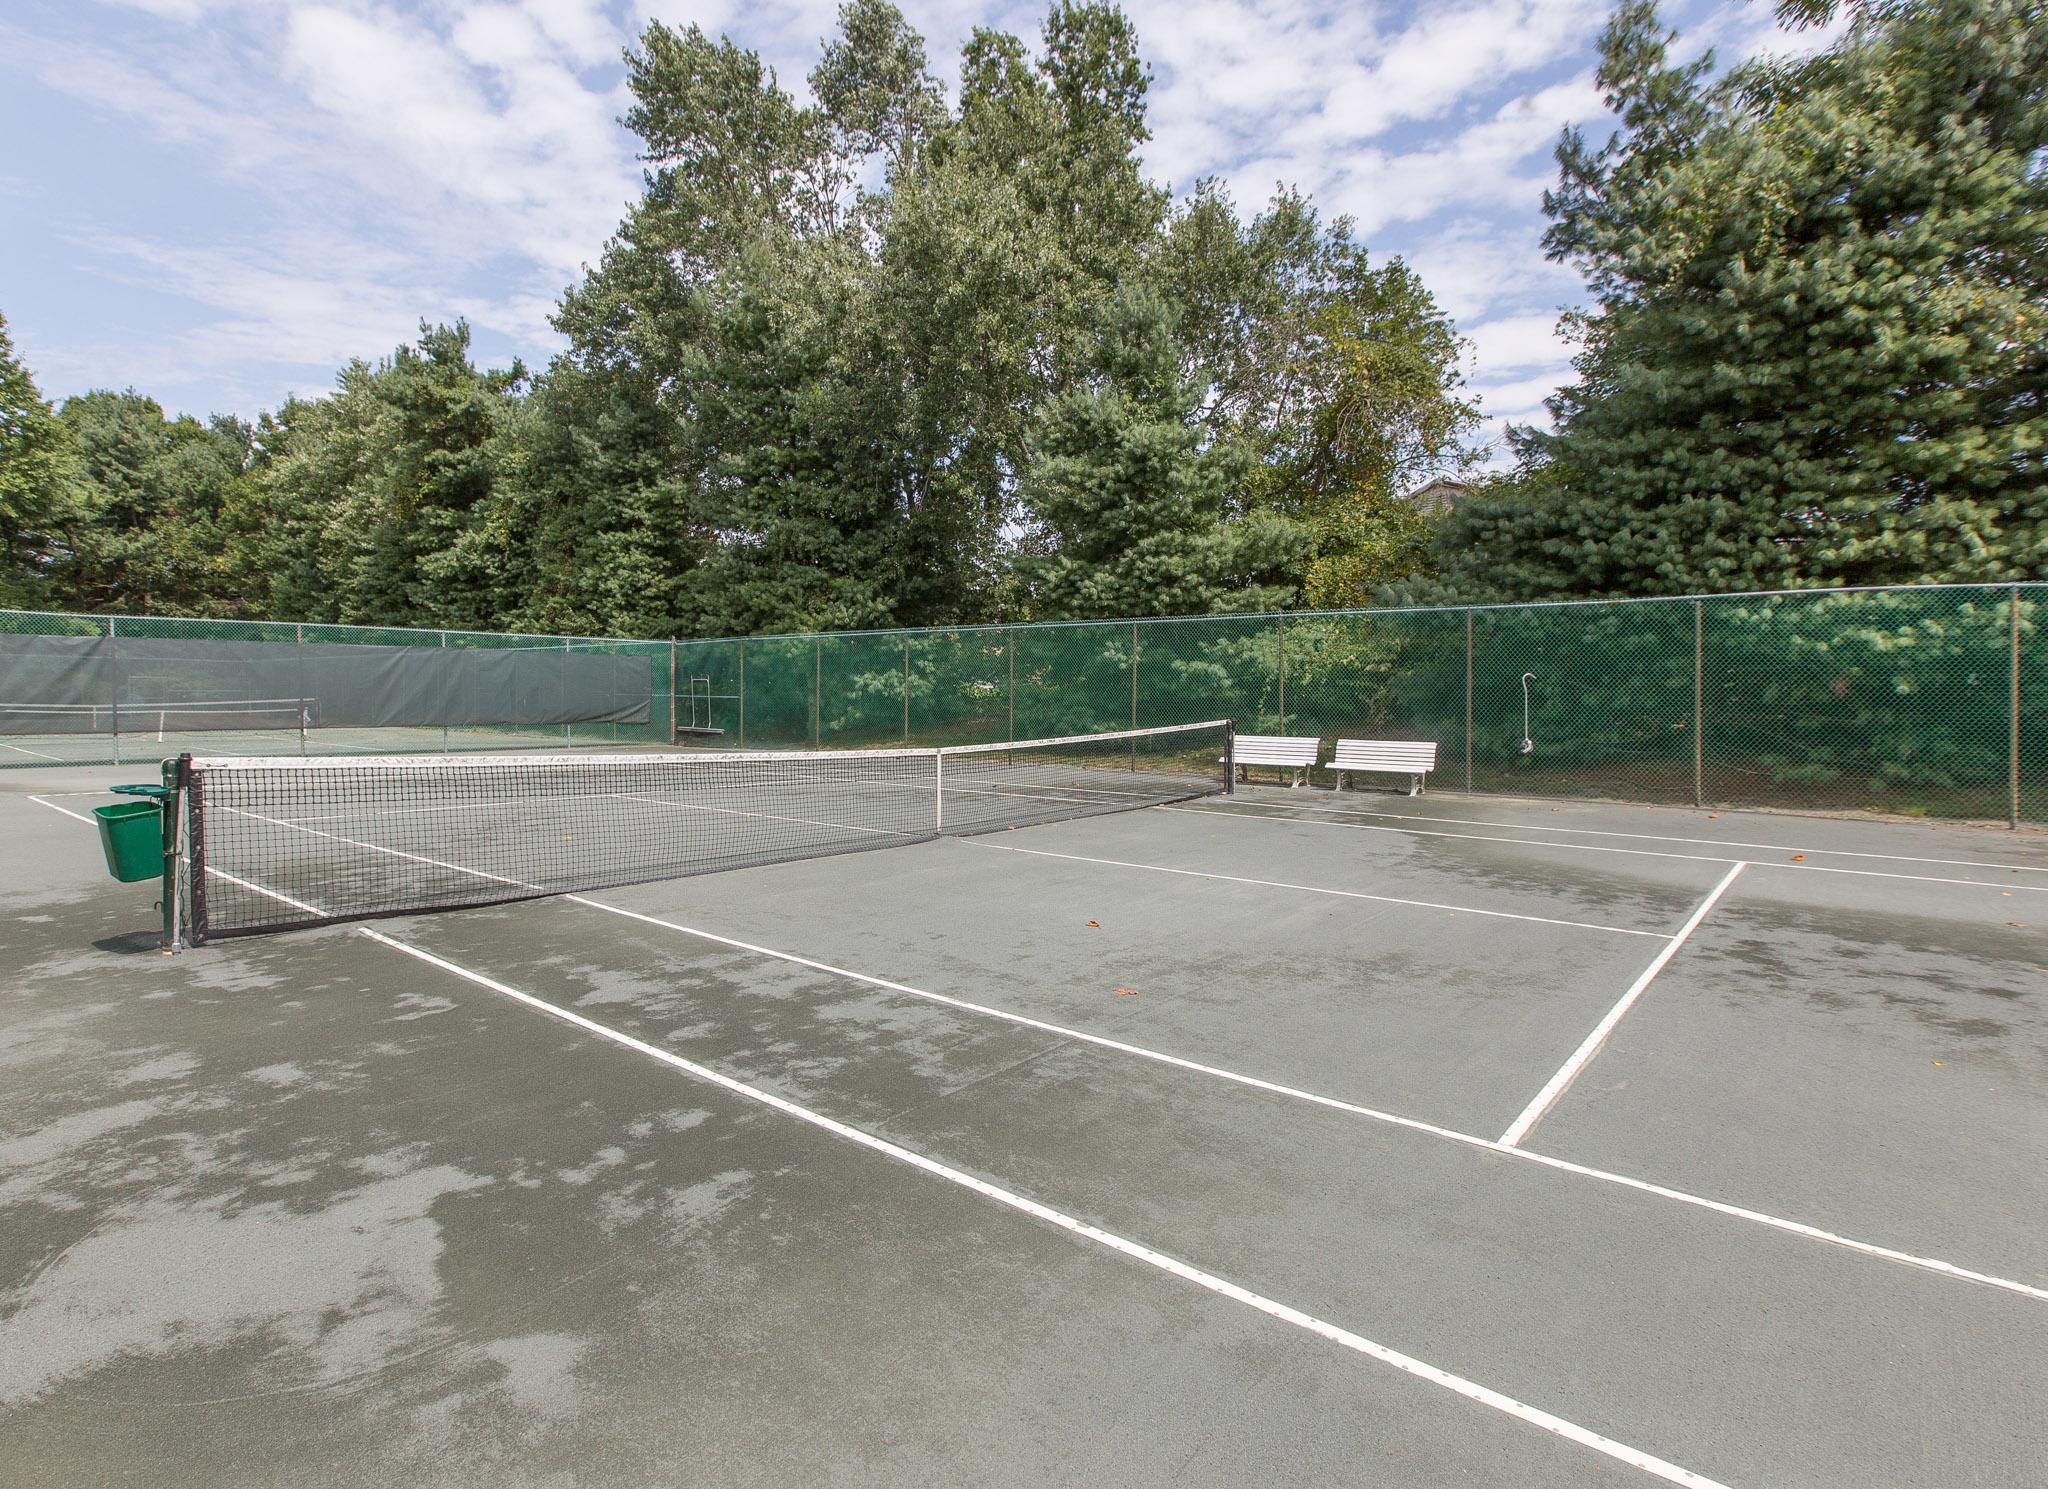 29 tennis court .jpg